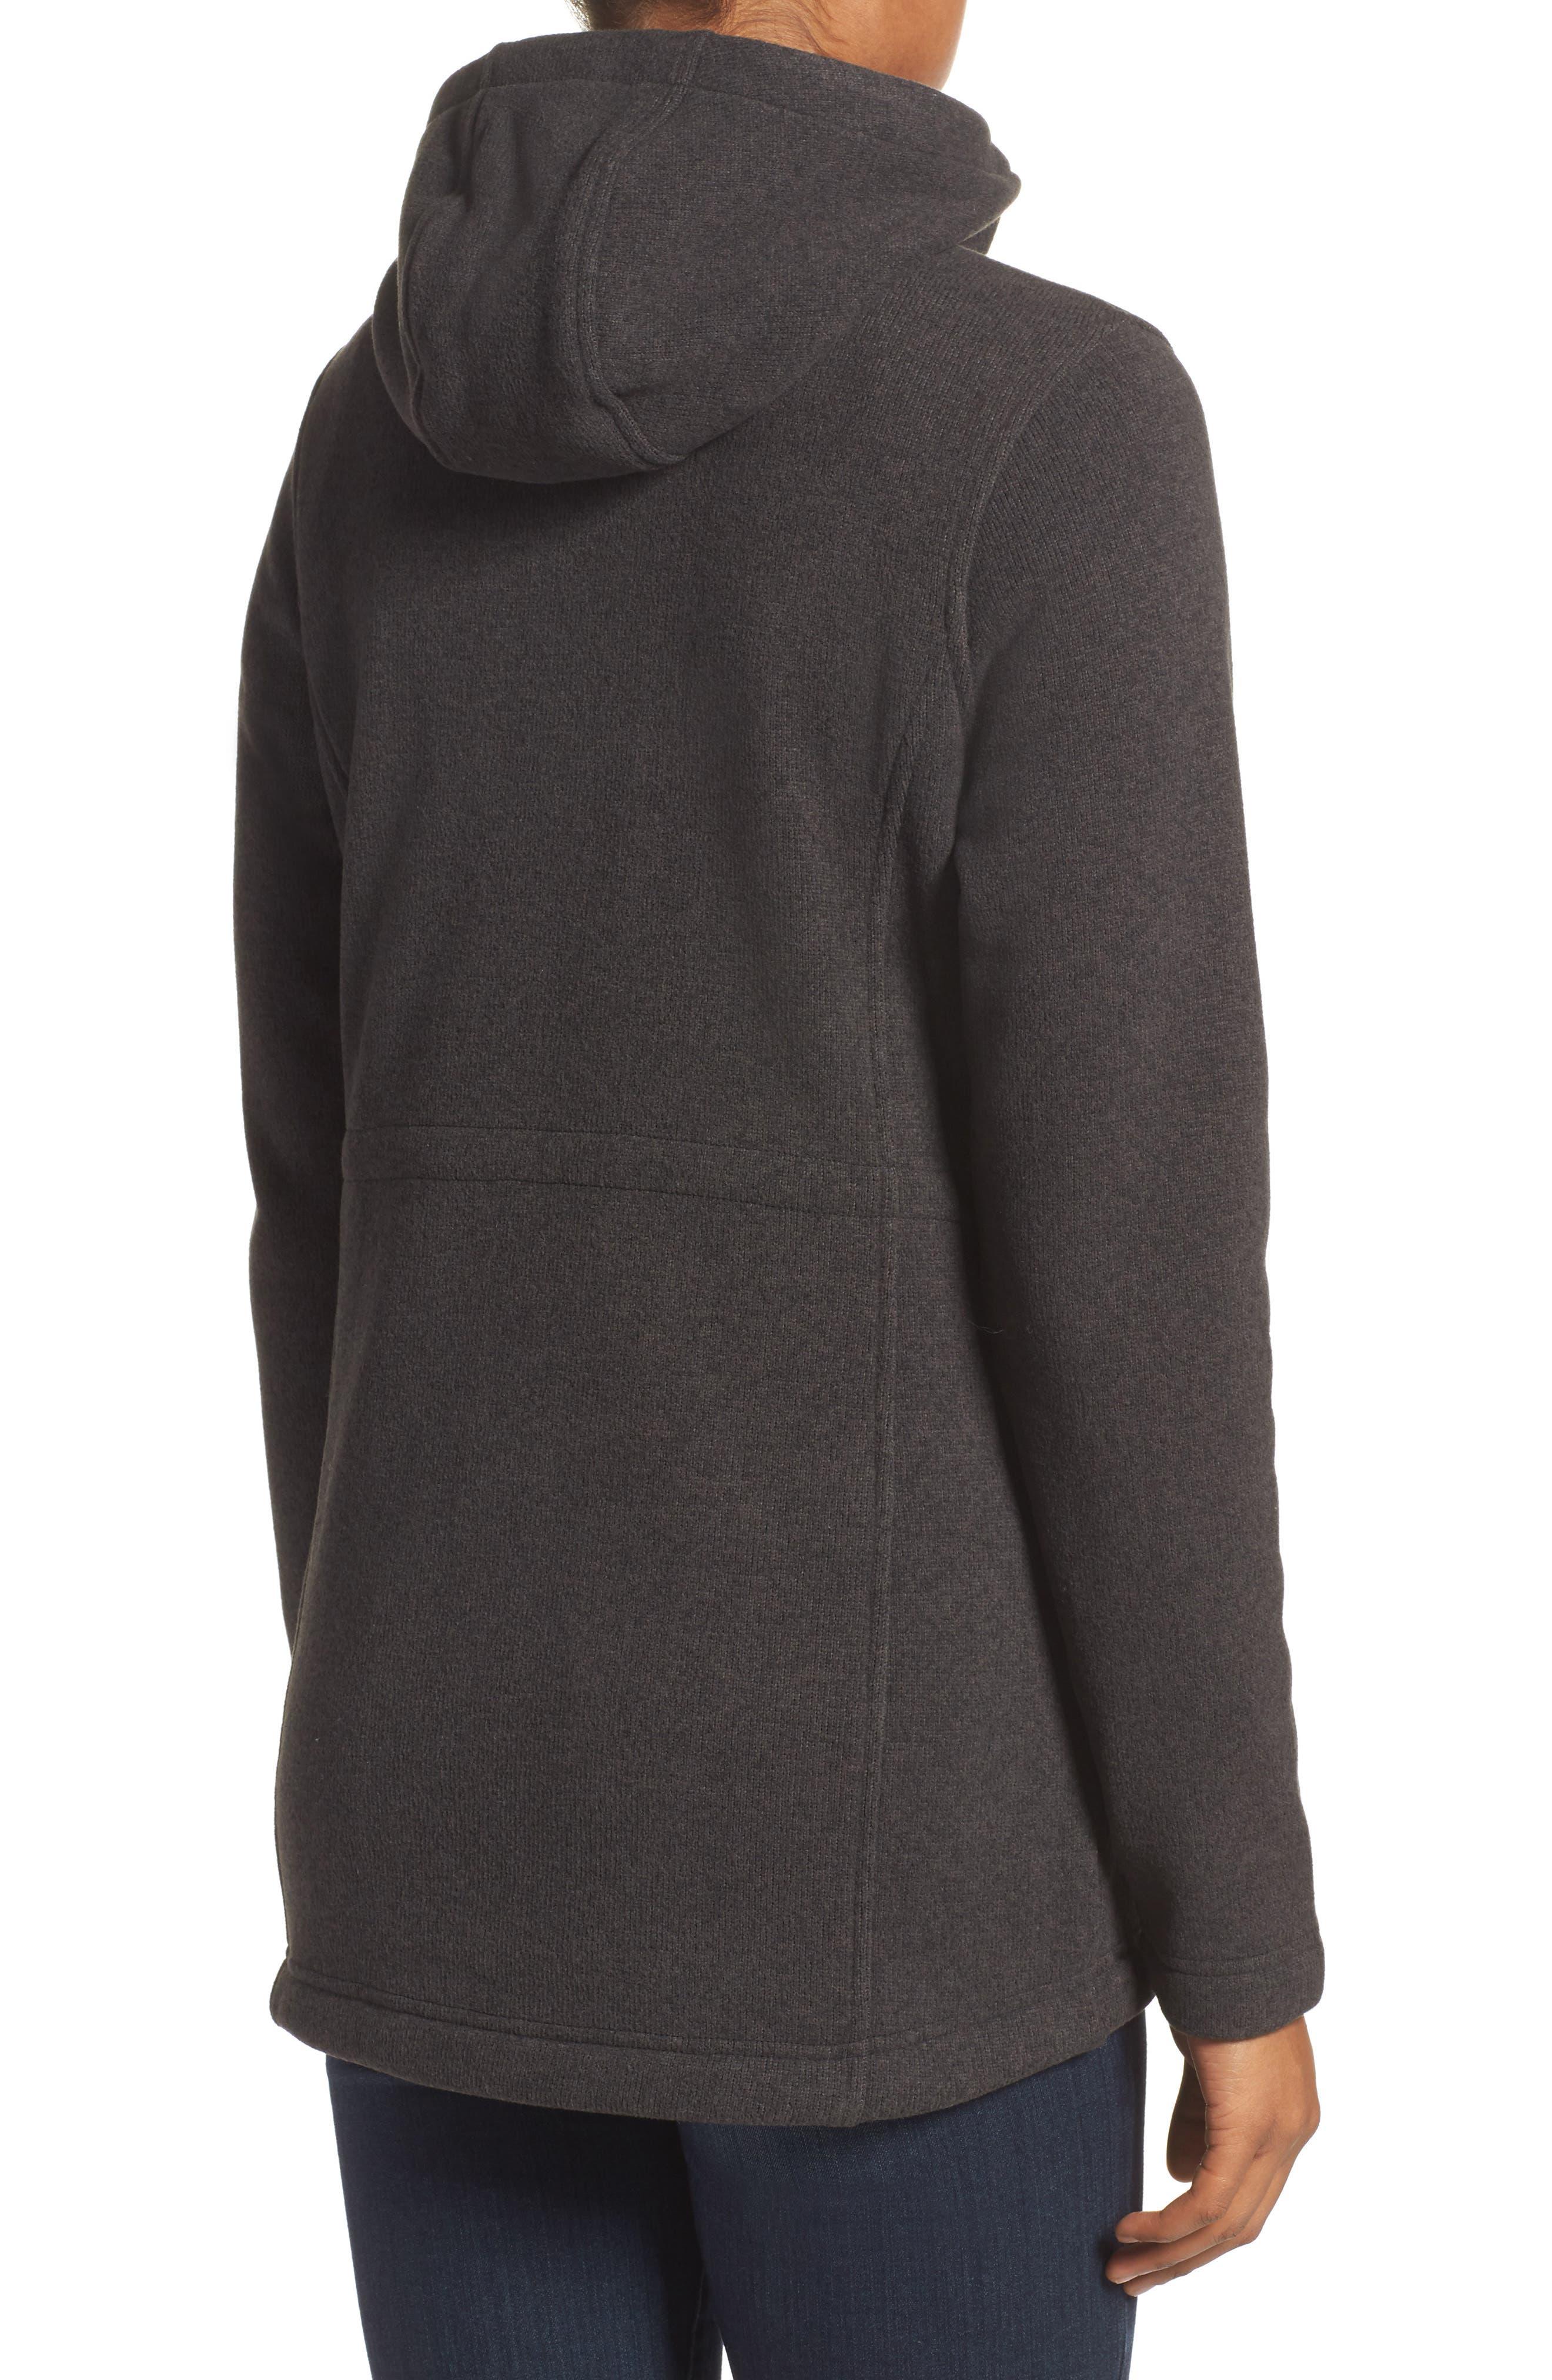 Crescent Parka Fleece,                             Alternate thumbnail 2, color,                             Tnf Black Heather